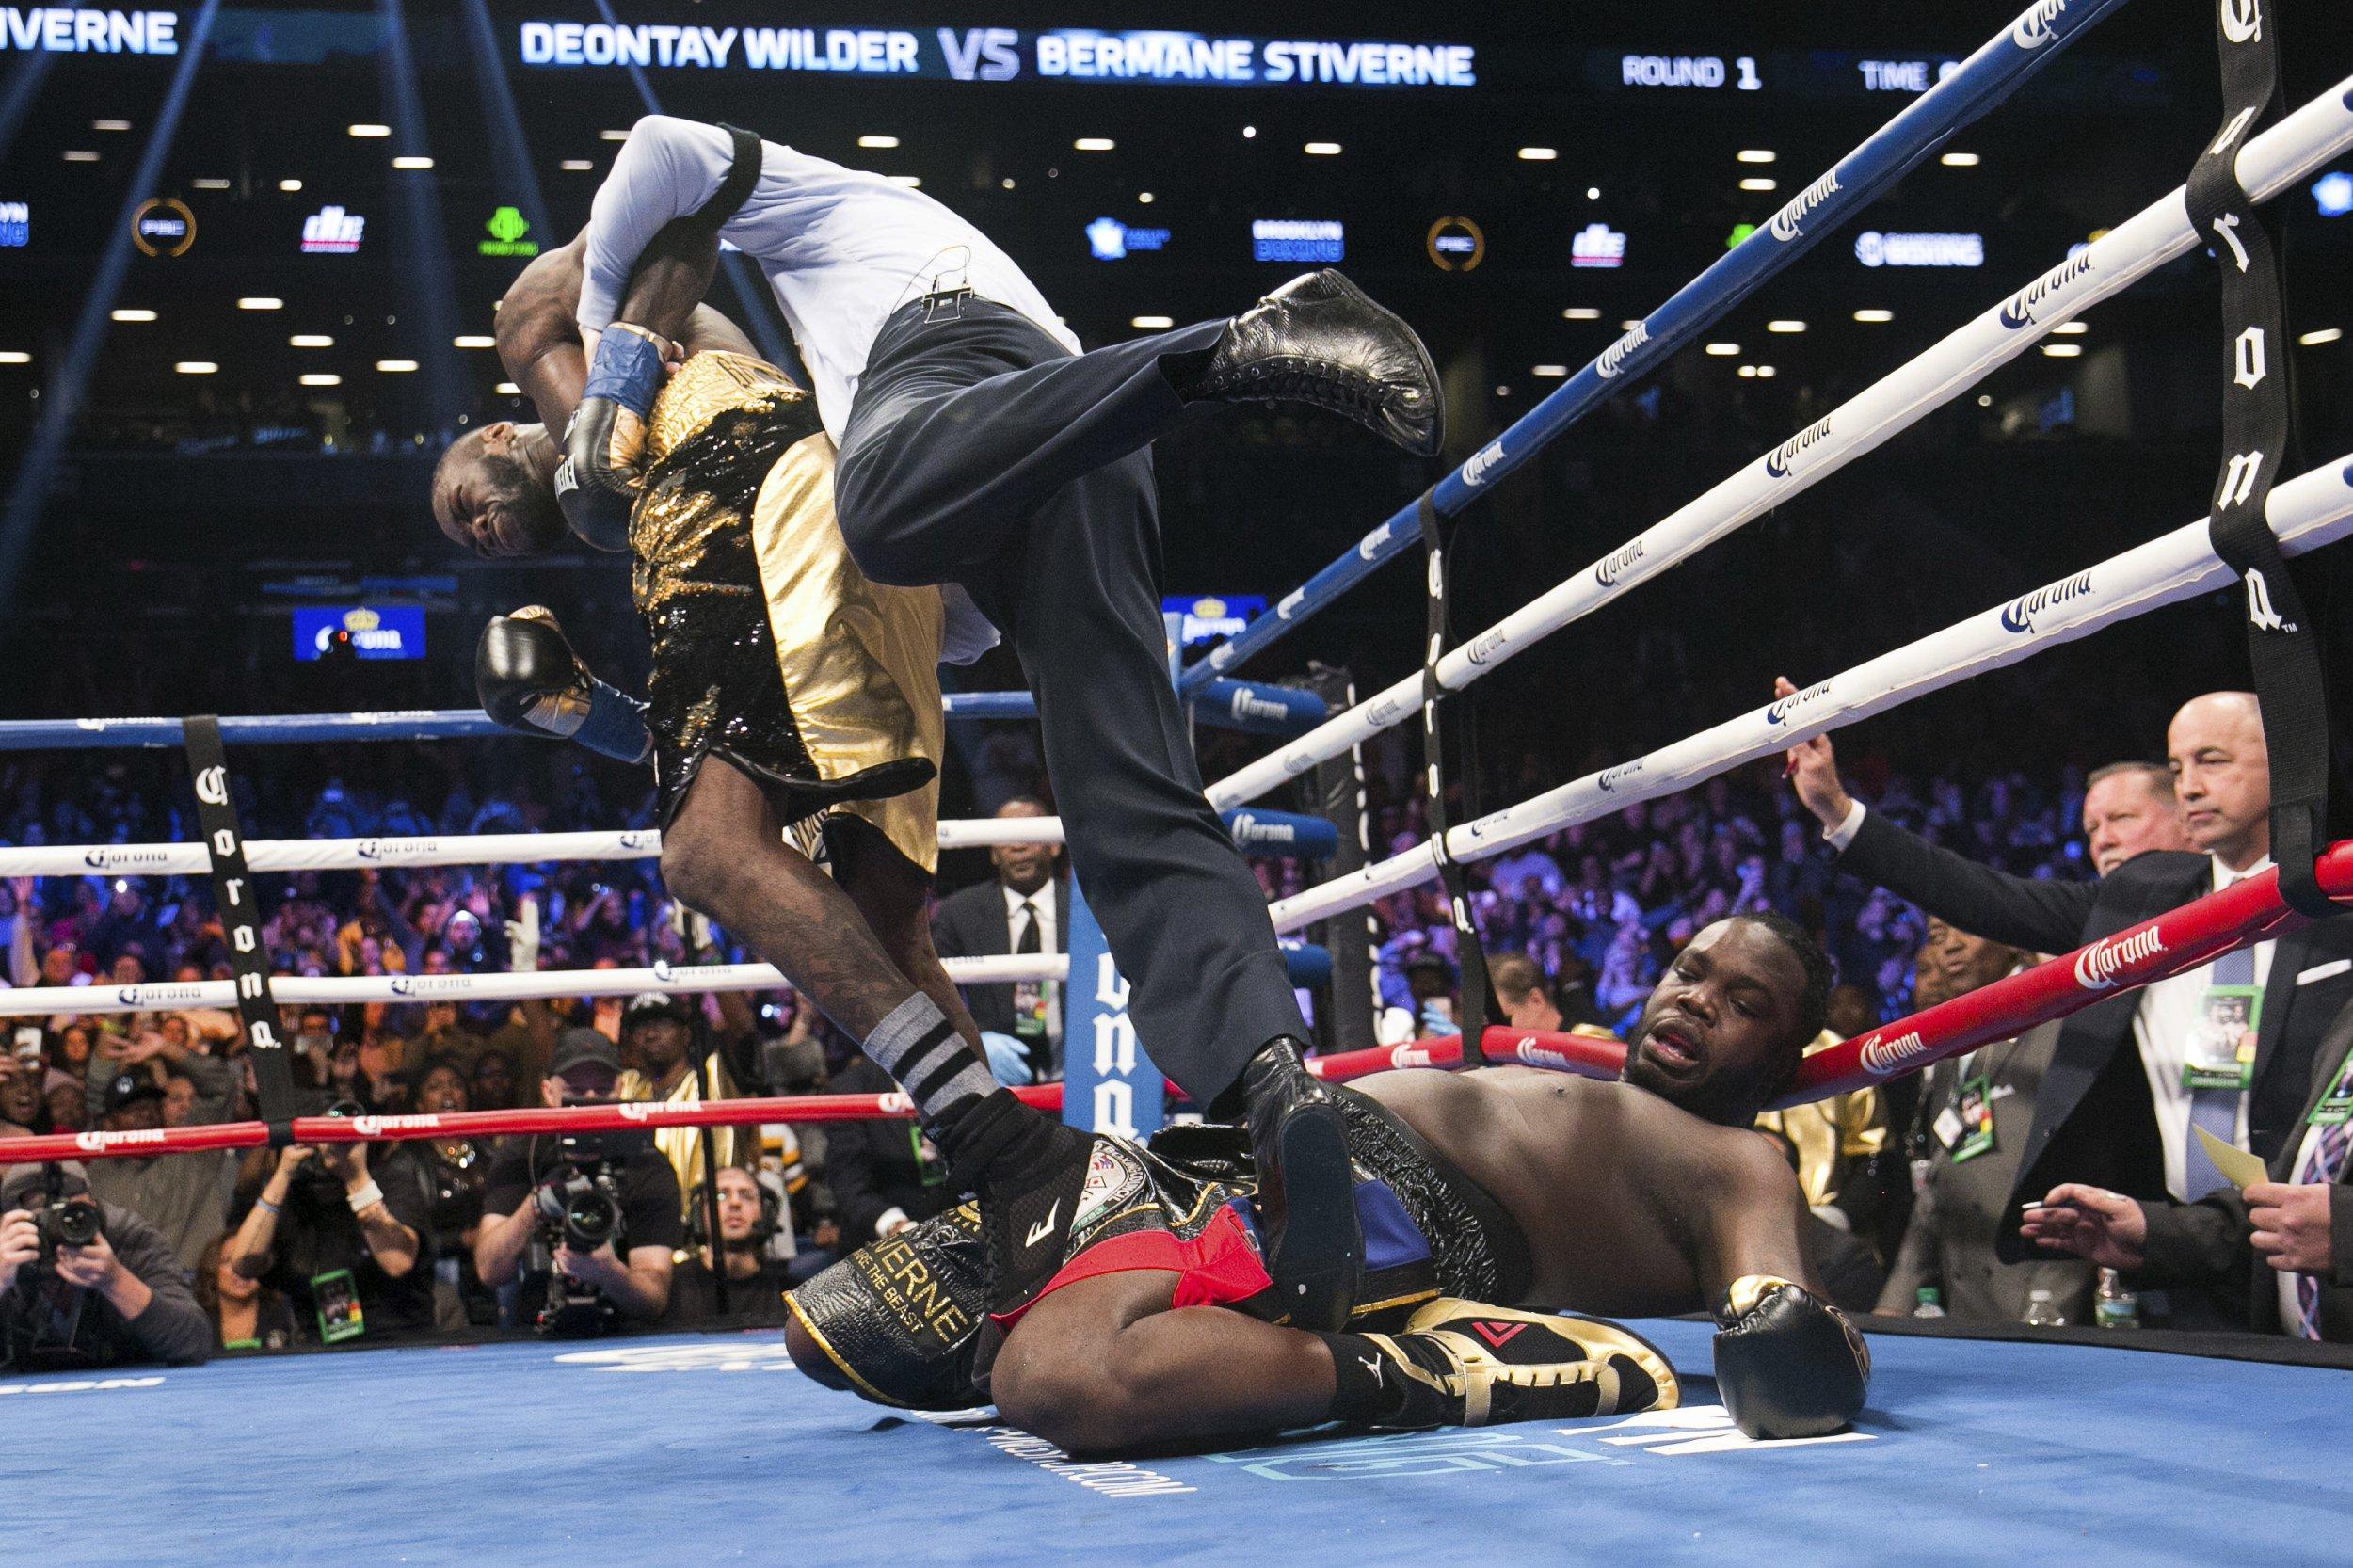 Deontay Wilder calls out Anthony Joshua after brutal knockout victory against Bermane Stiverne